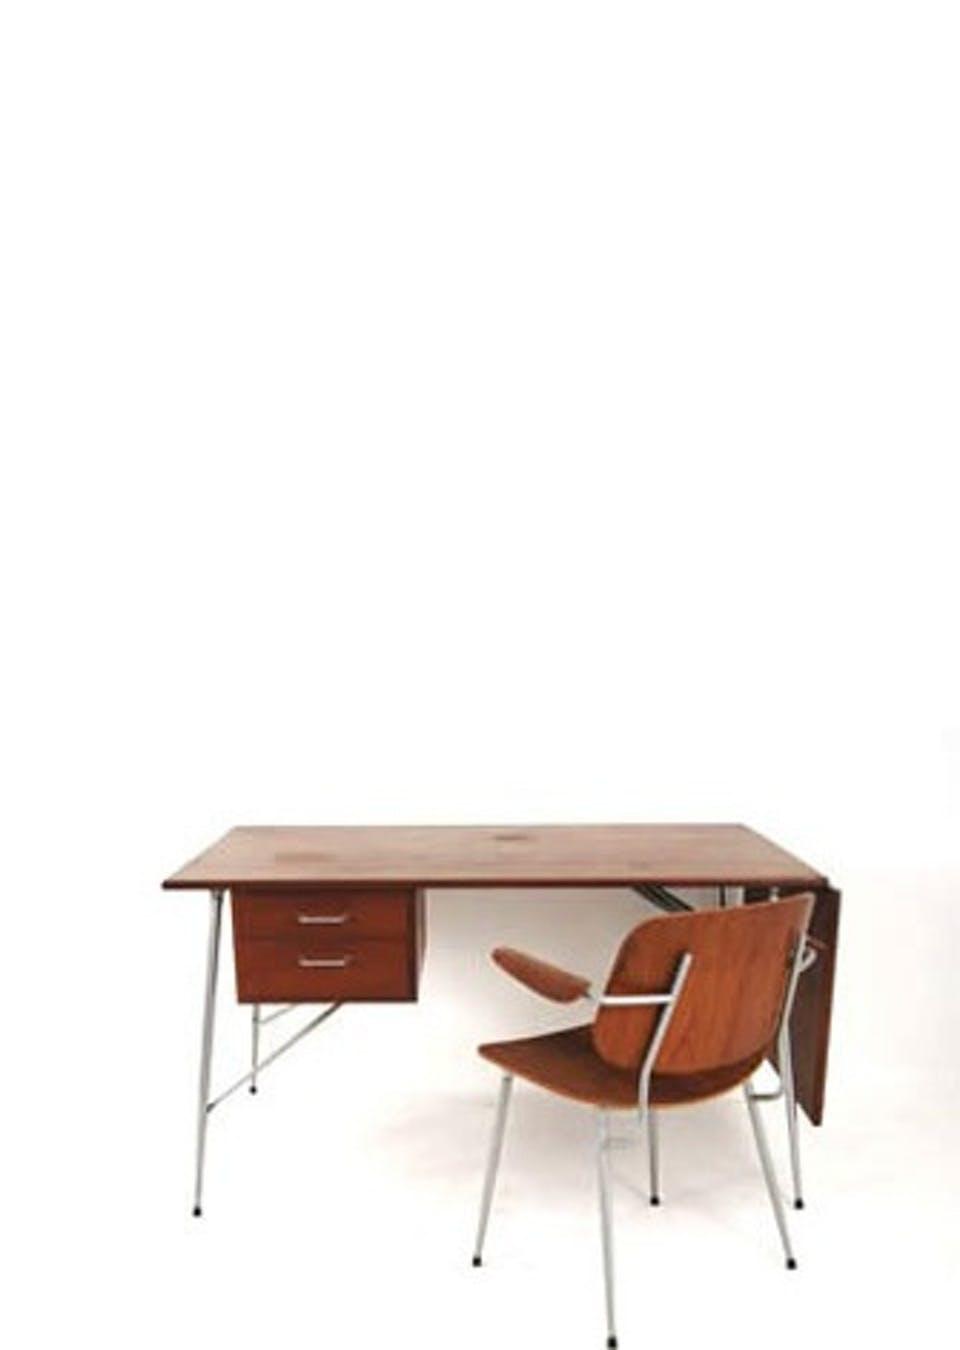 Børge Mogensen - Skrivebord og stol